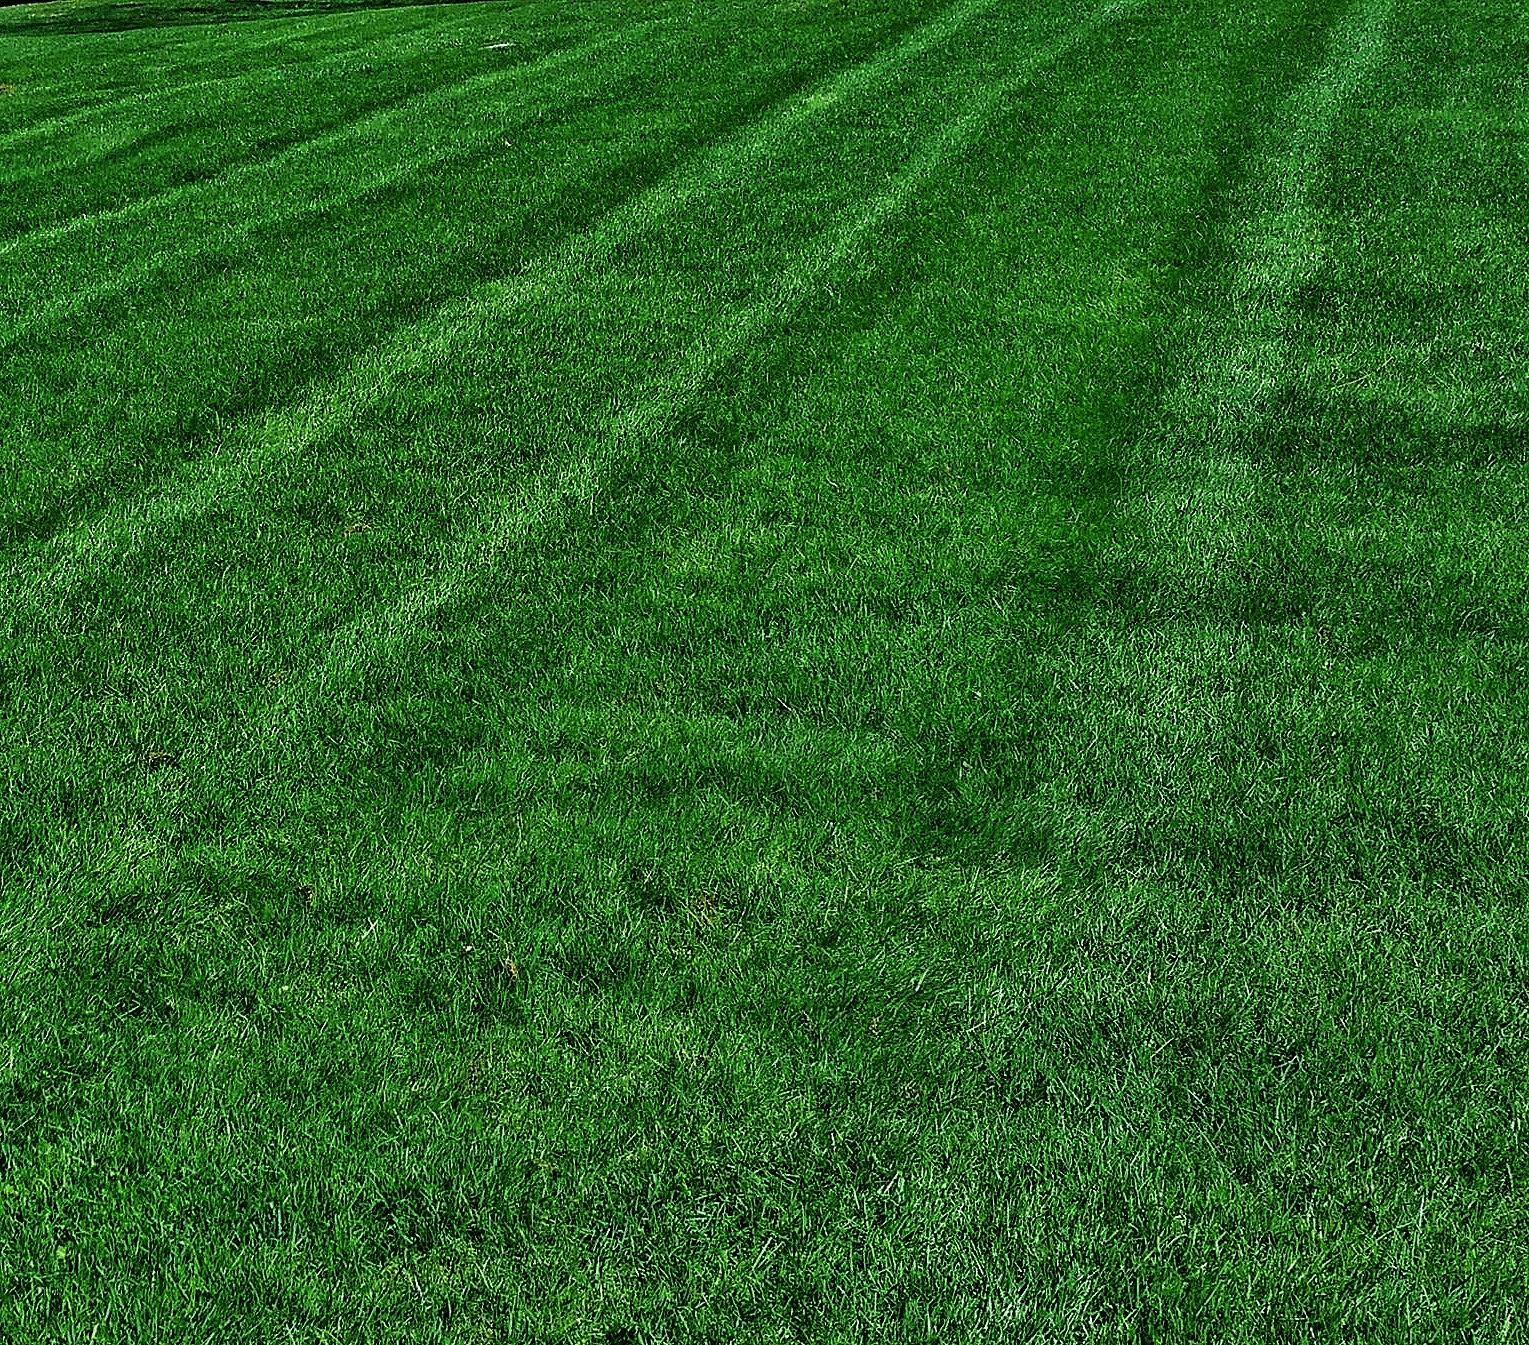 Customized - Fertilizer Programs